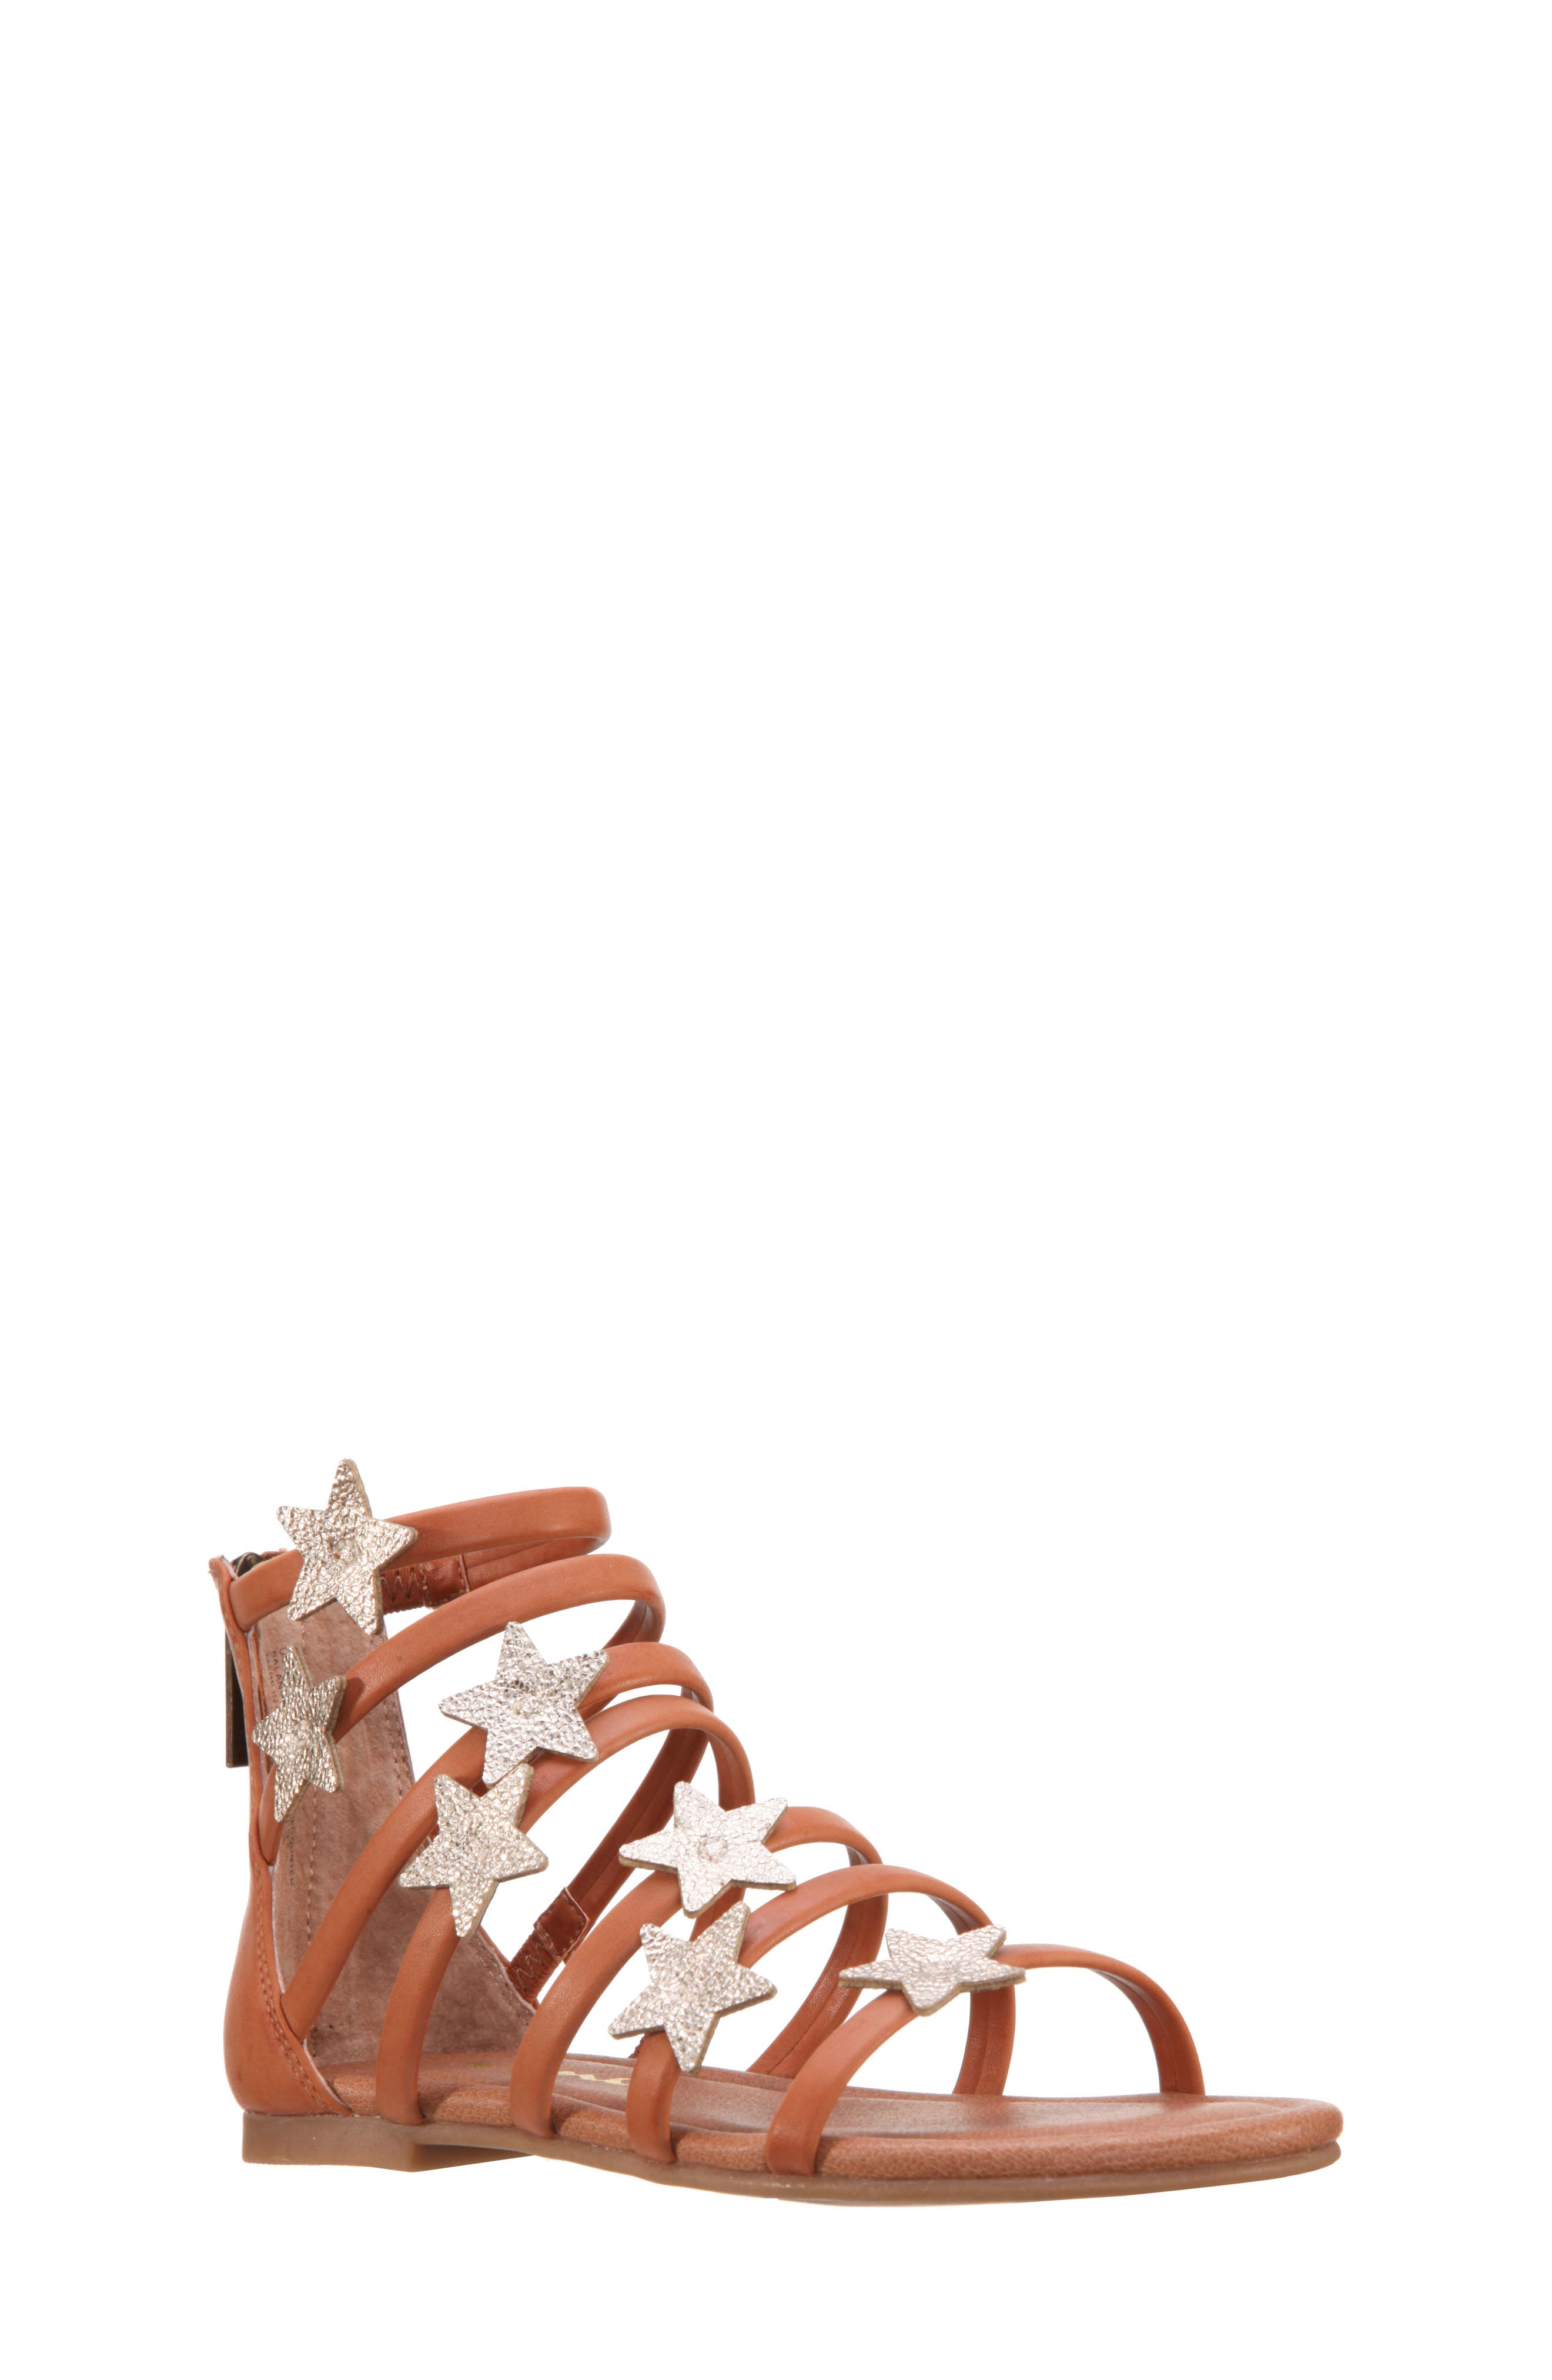 Robertha Gladiator Sandal,                             Main thumbnail 1, color,                             710